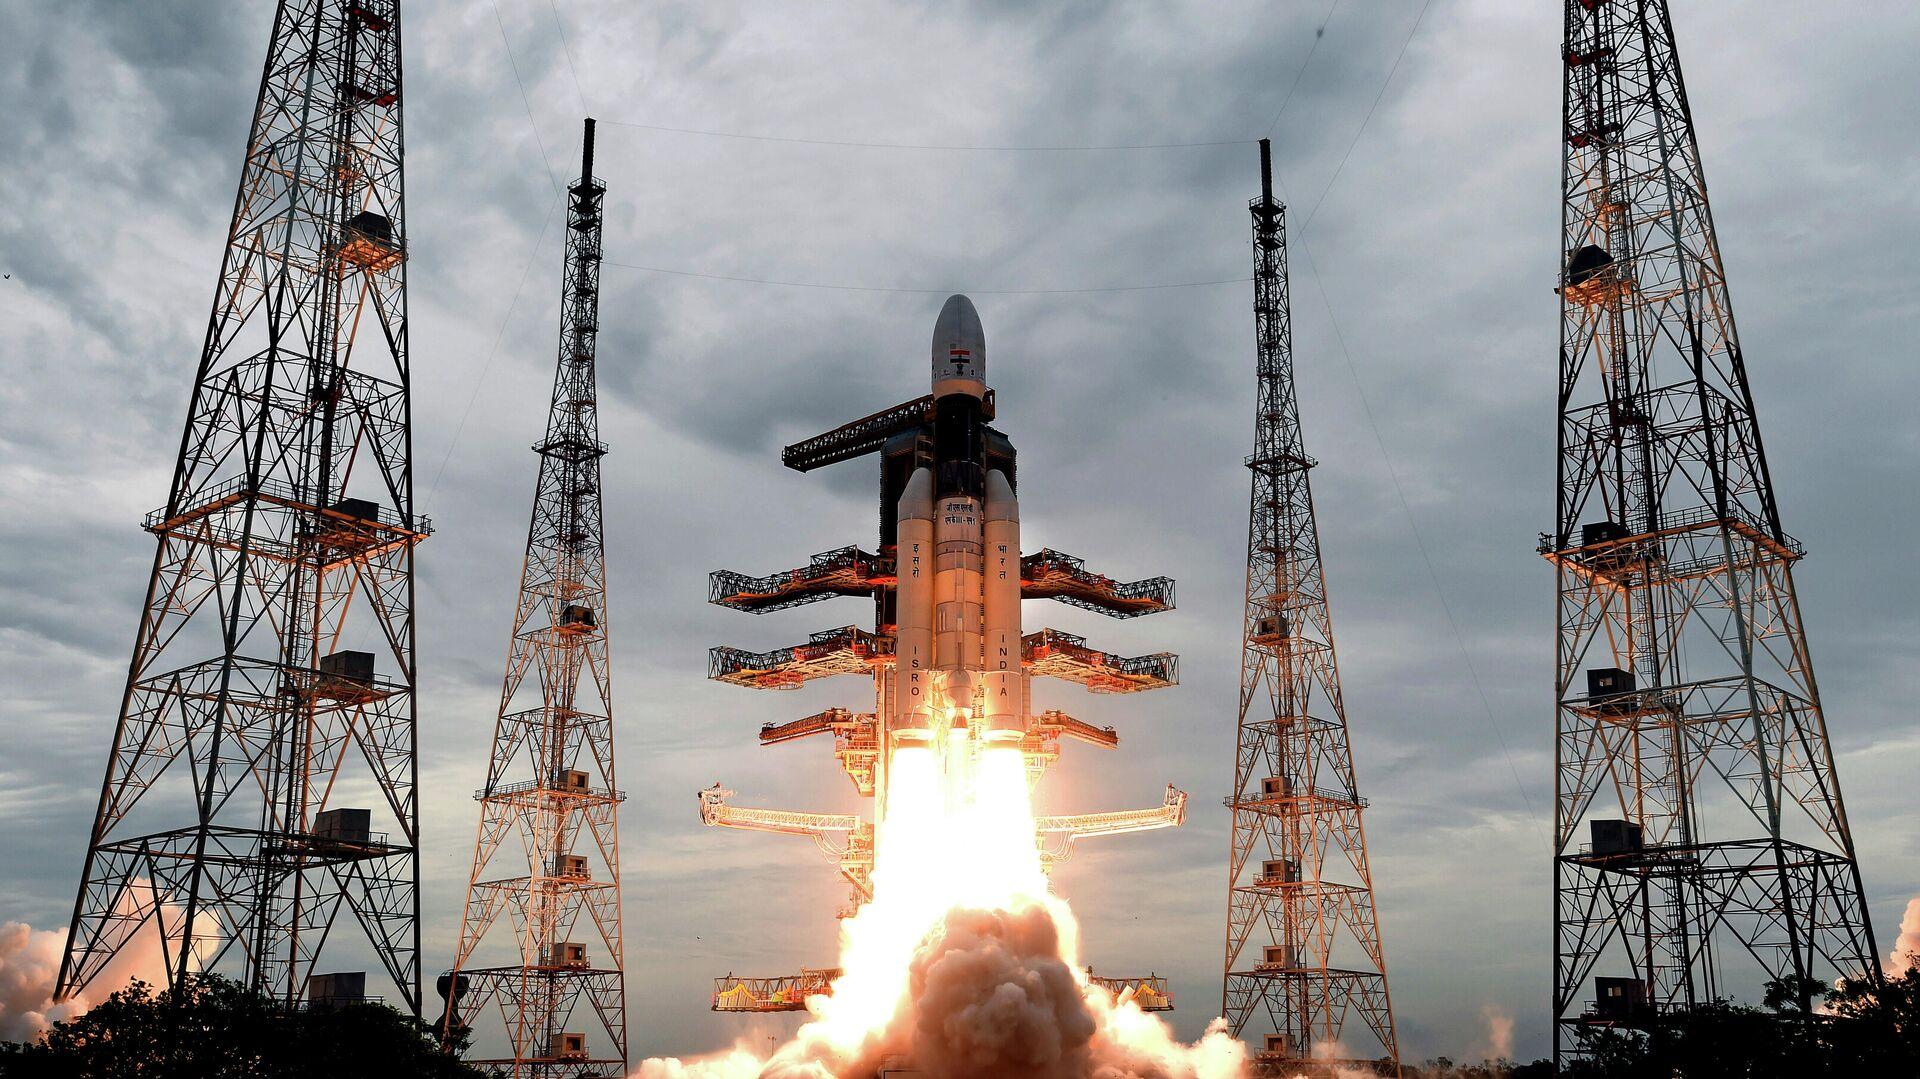 Запуск ракеты-носителя Mk III с автоматической станцией Чандраян-2 с космодрома космического центра имени Сатиша Дхавана - РИА Новости, 1920, 28.02.2021